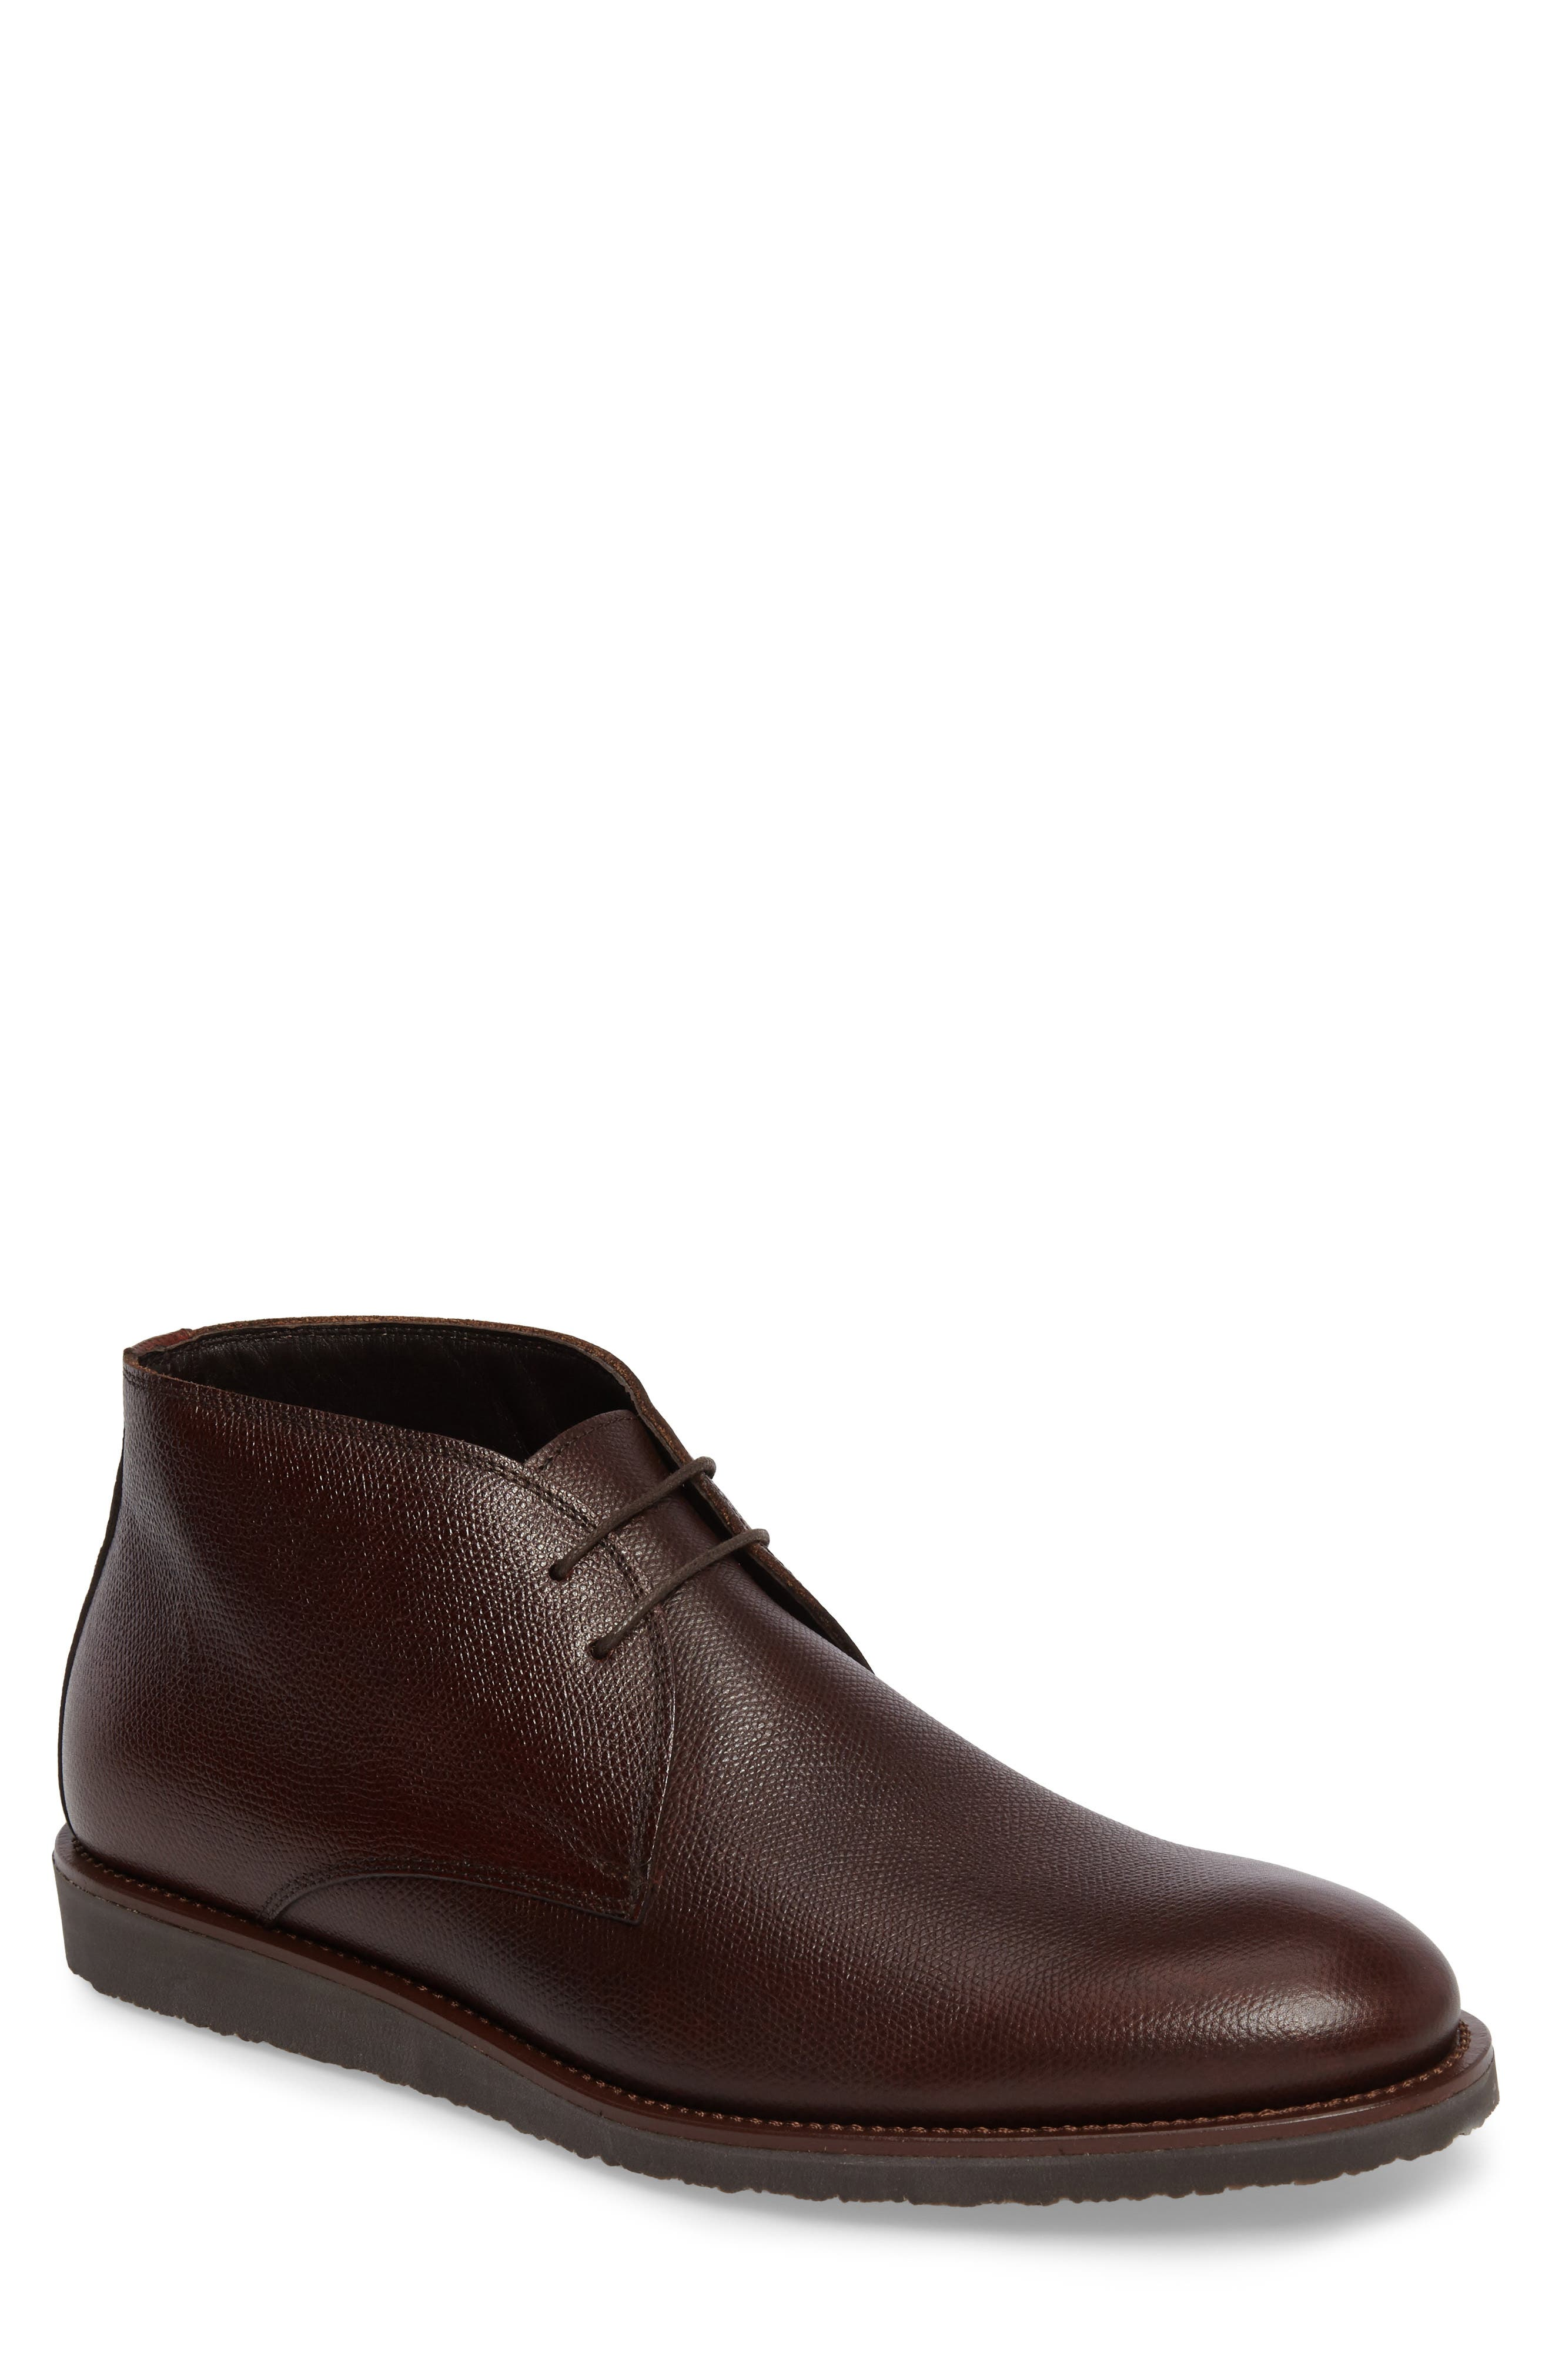 Franklin Chukka Boot,                         Main,                         color, 243